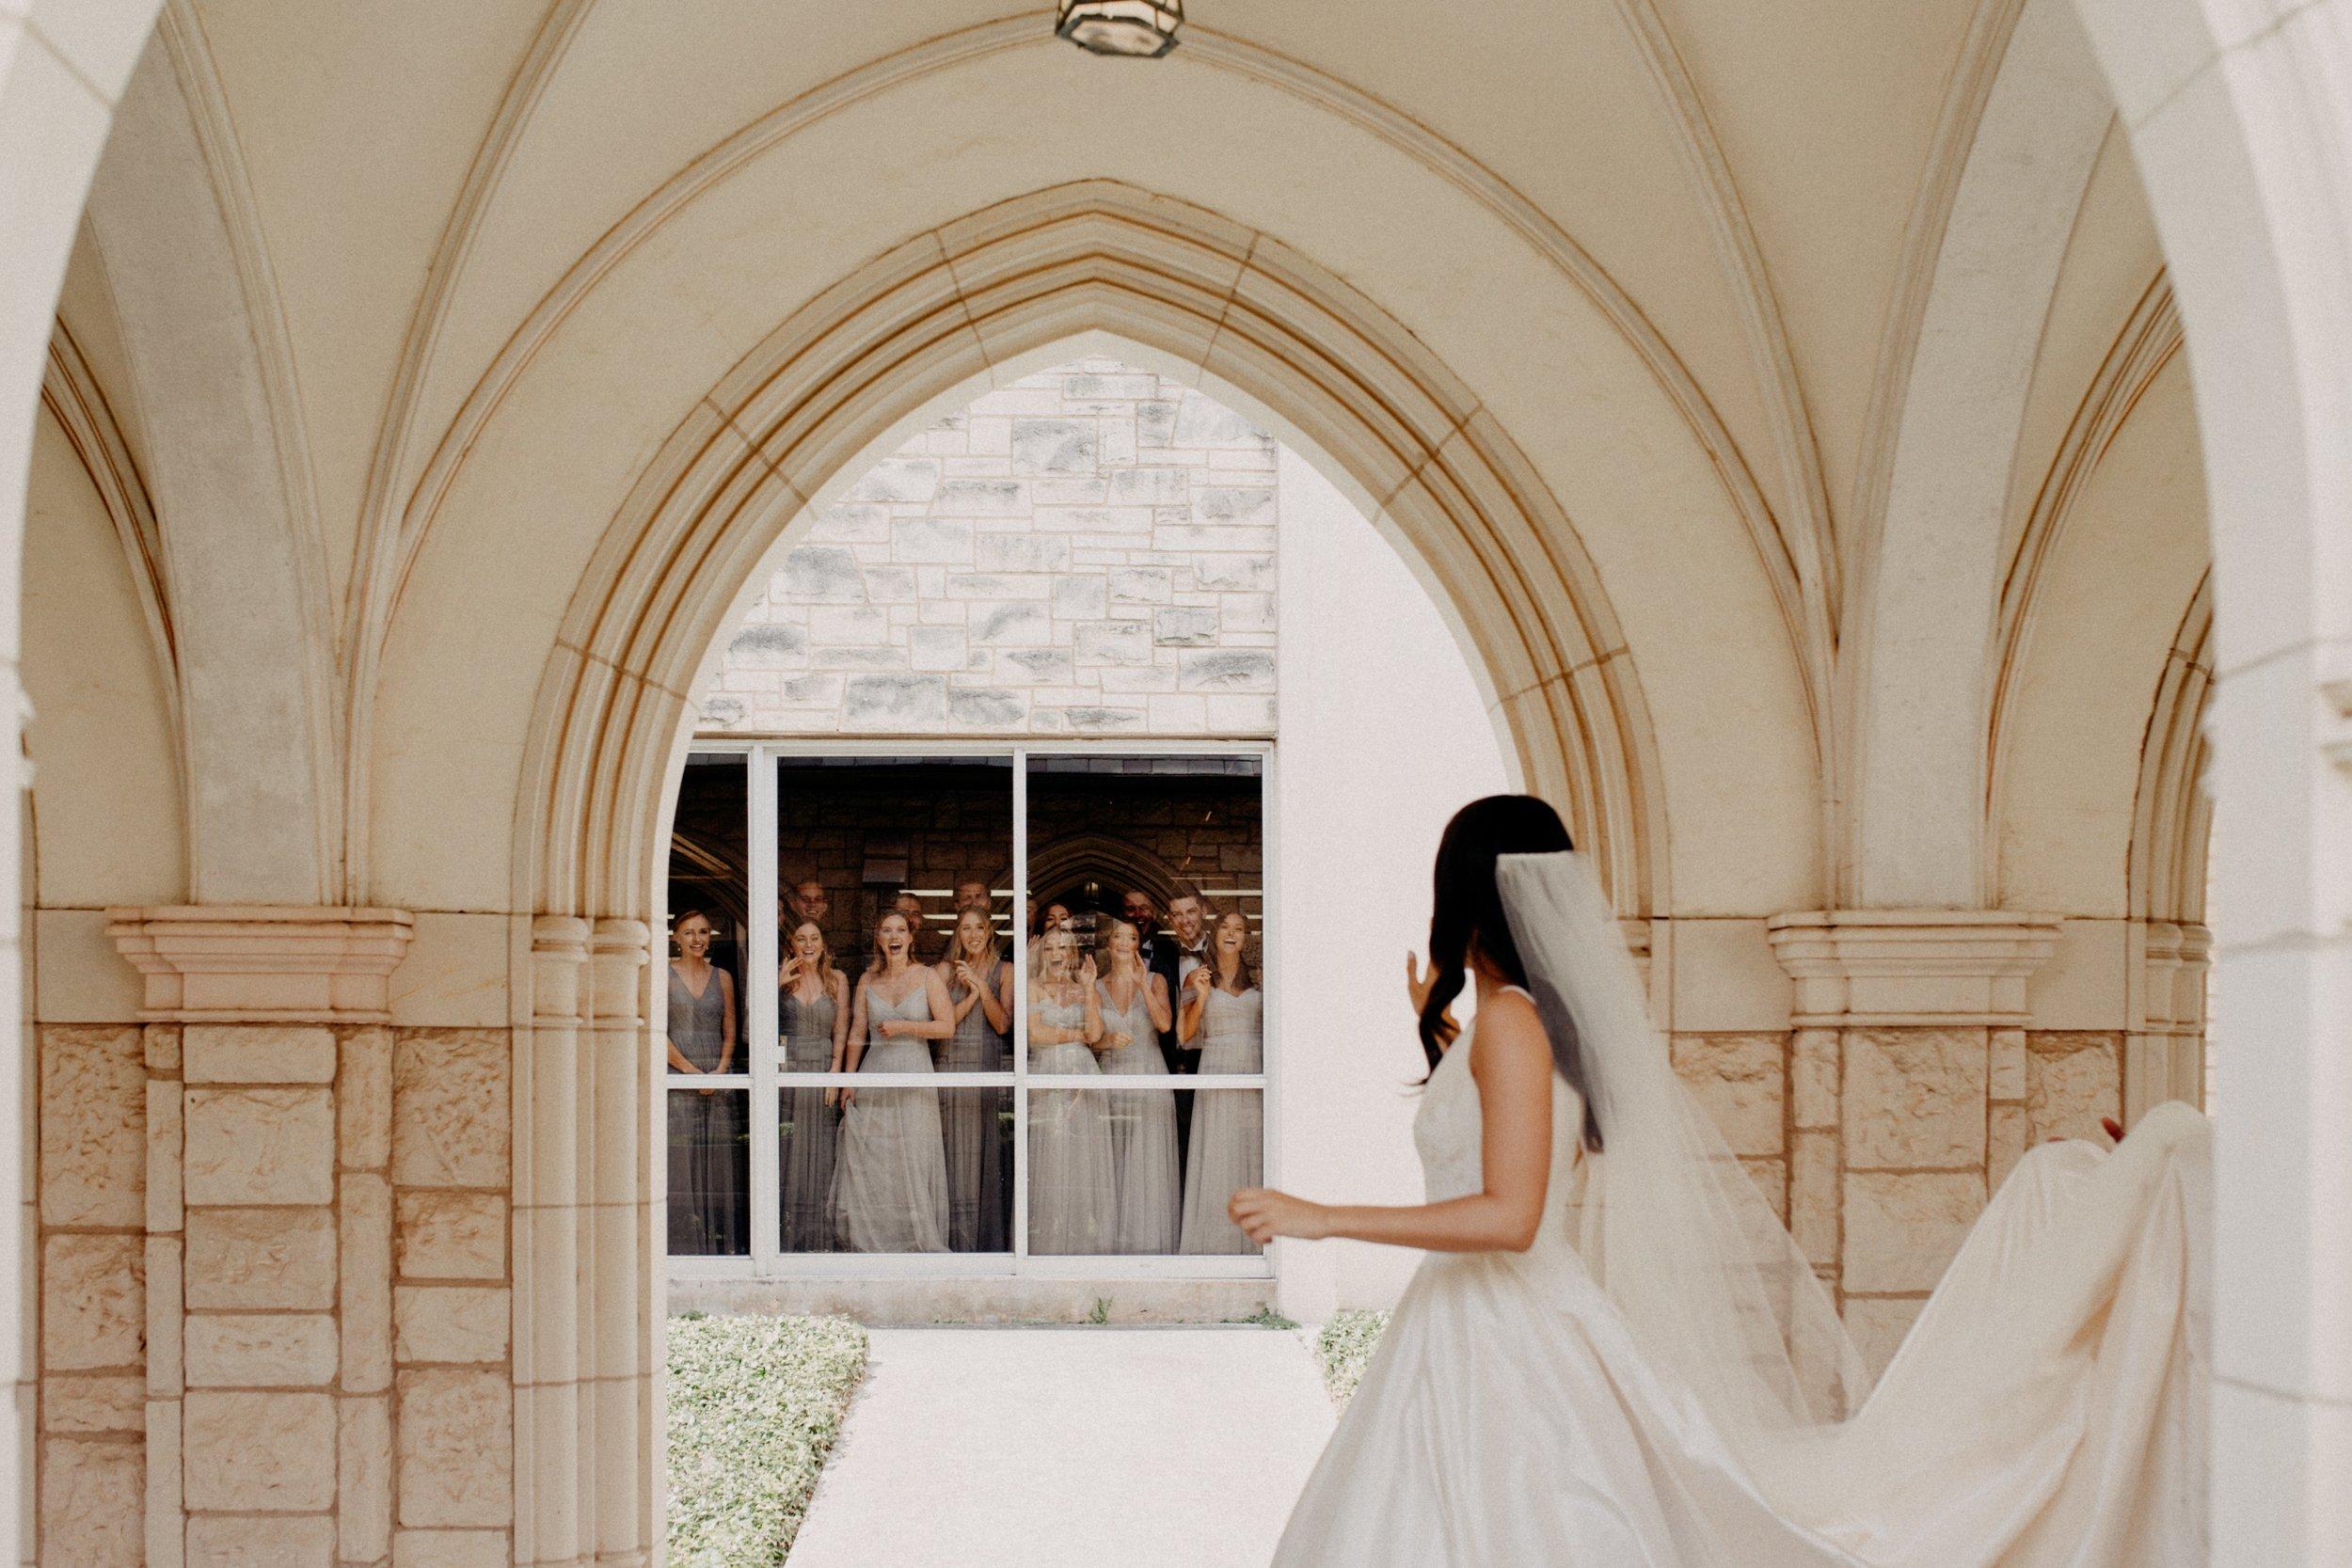 st-anthony-hotel-wedding-photography-10042san-antonio.JPG